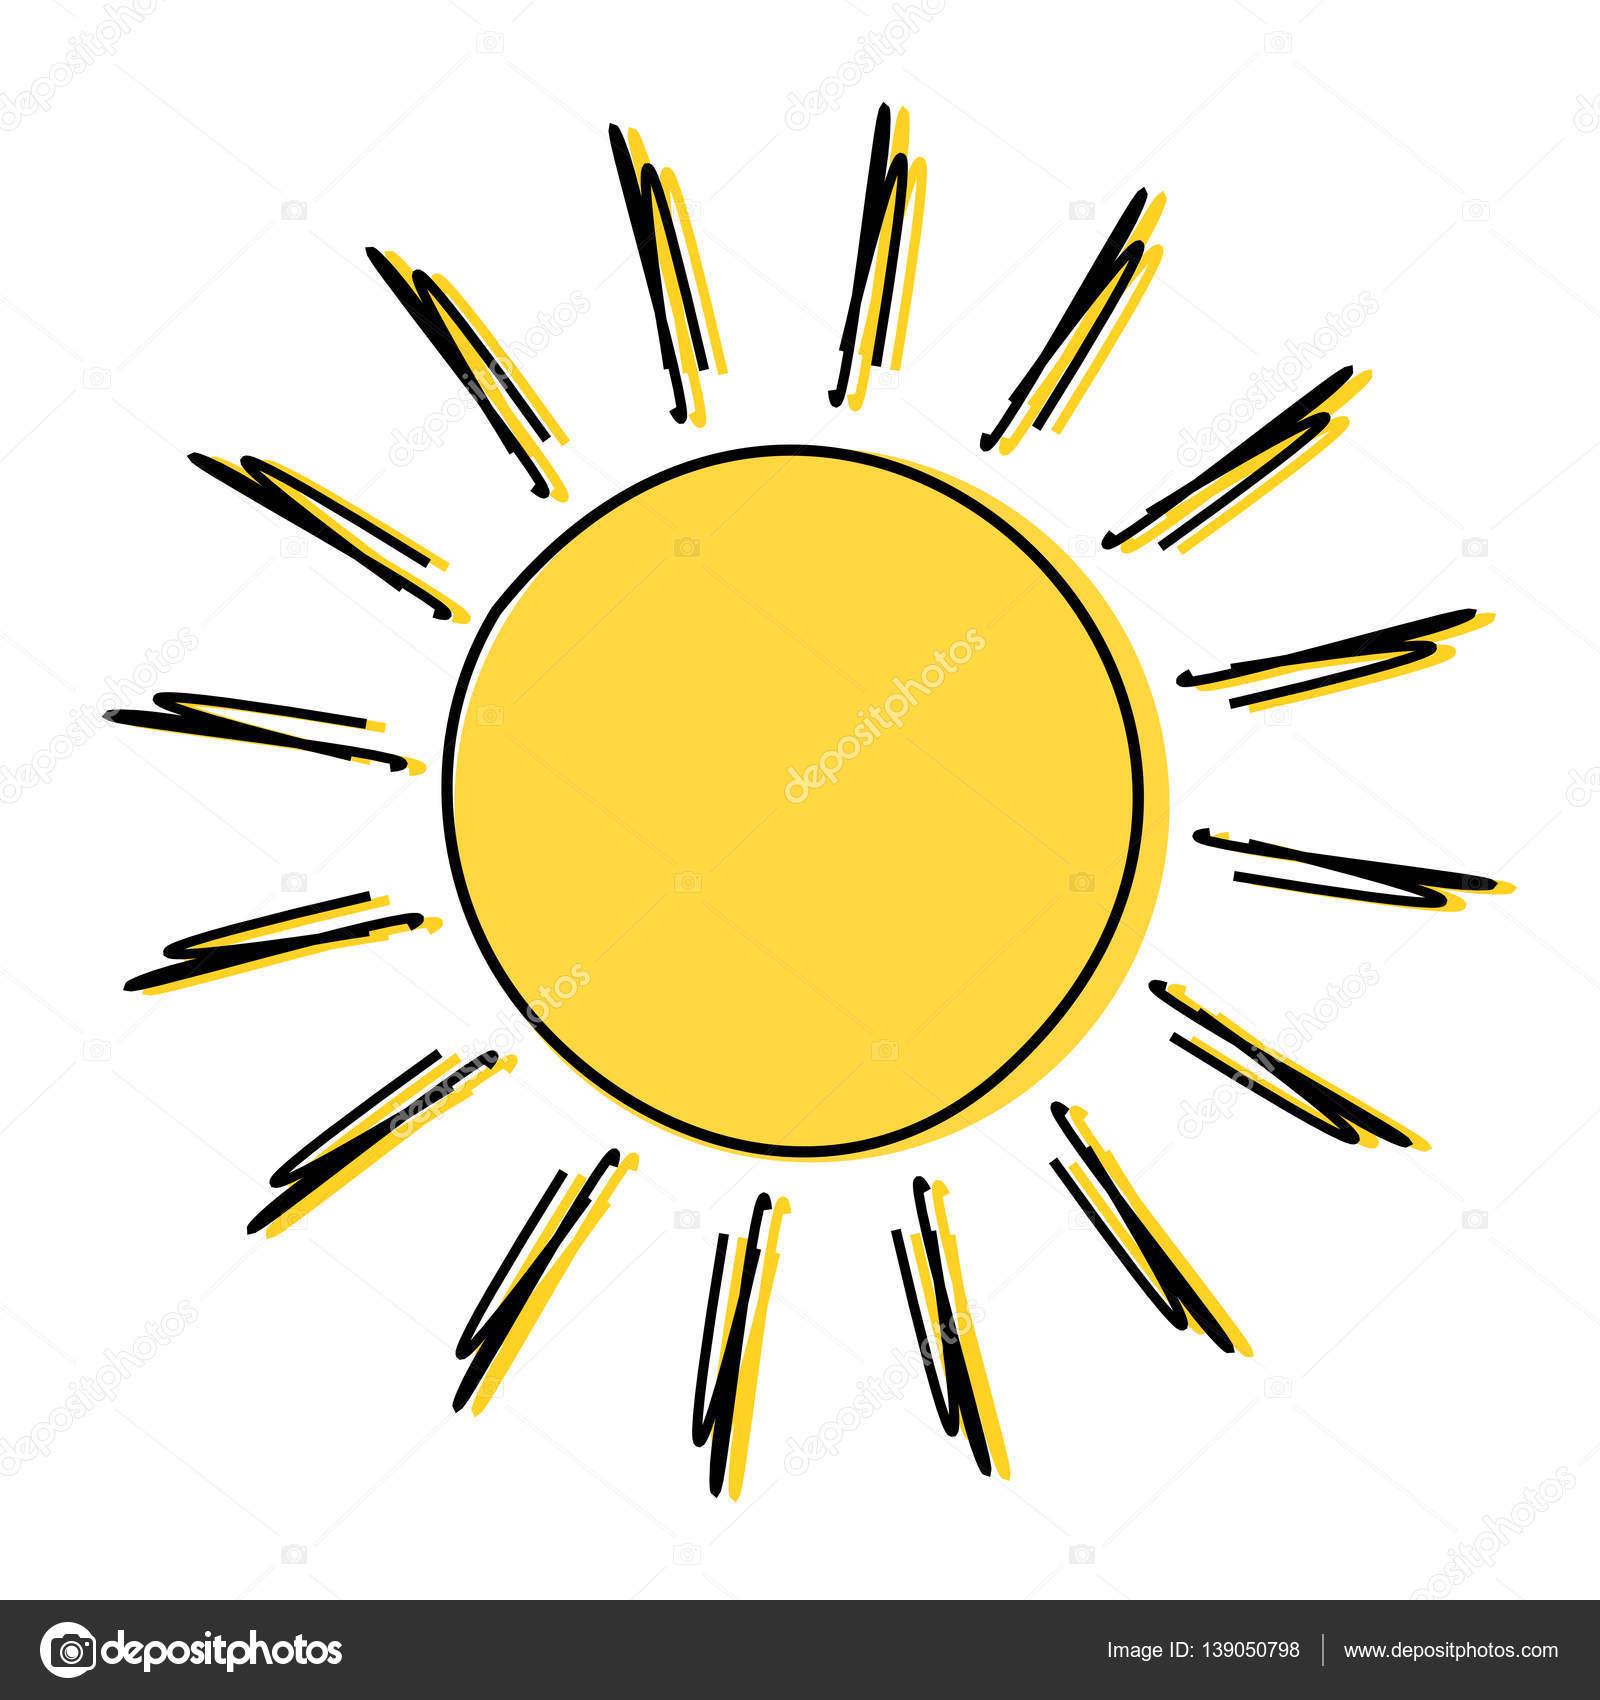 doodle dibujo sol archivo imágenes vectoriales studiobarcelona